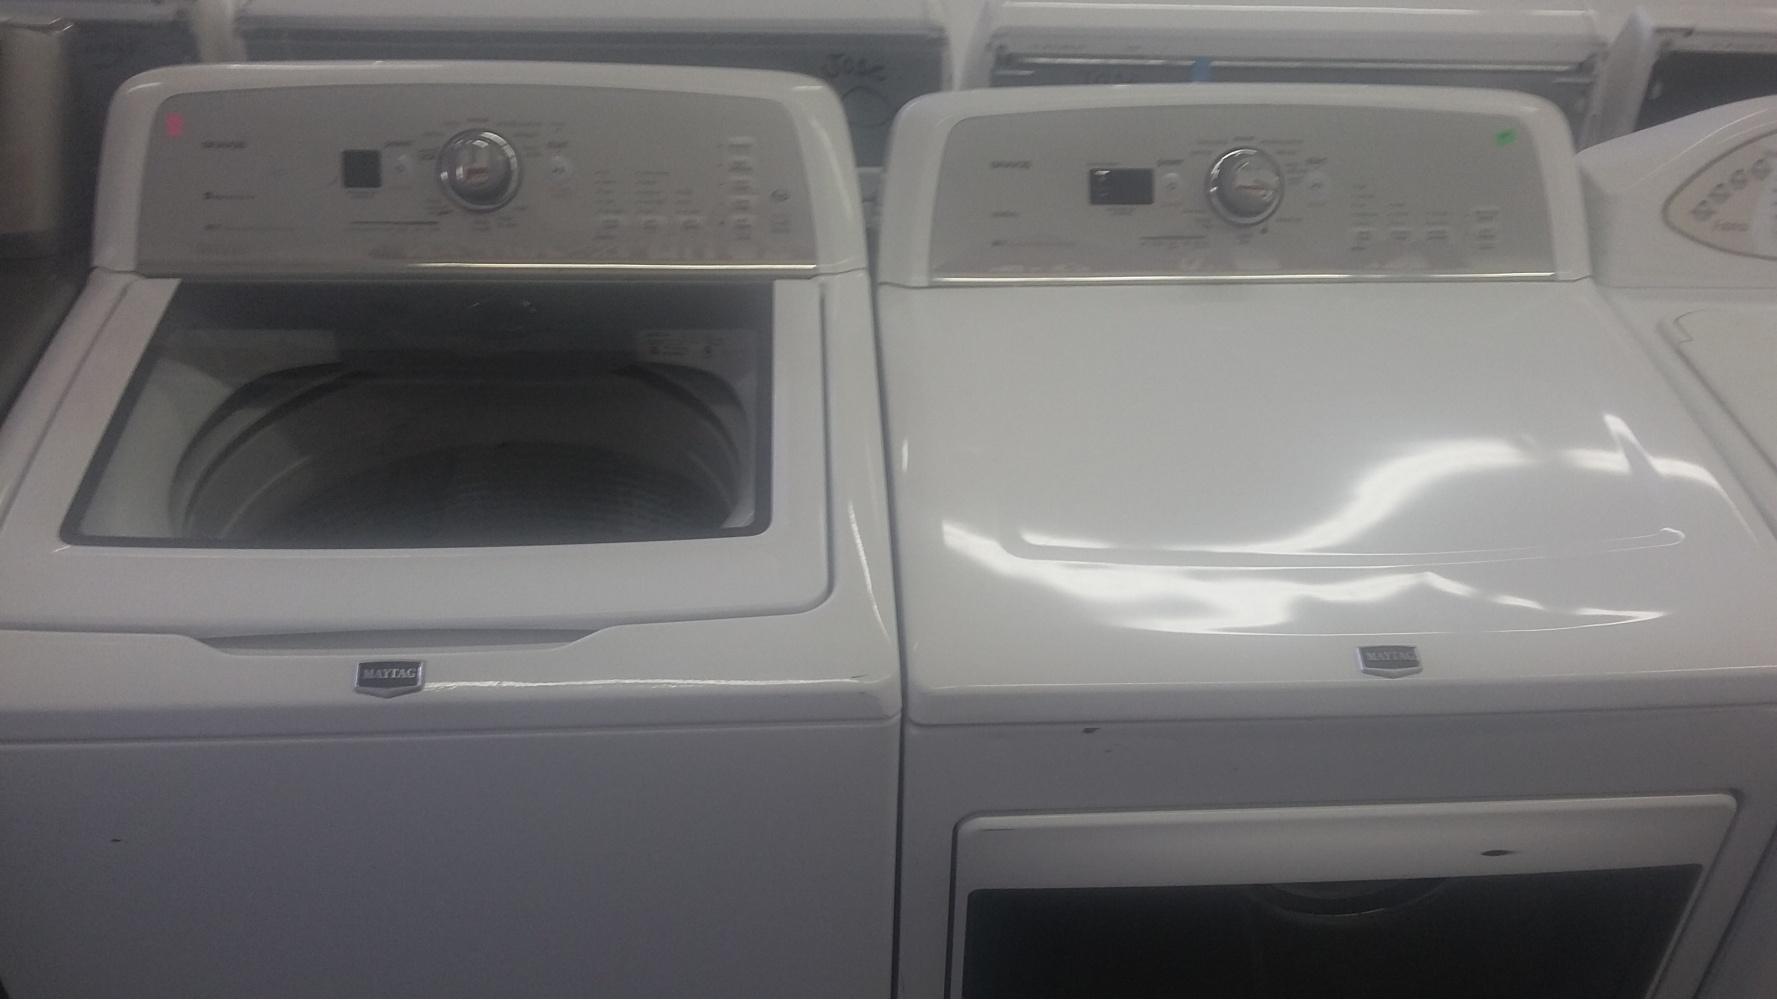 Maytag Bravos High Efficiency Top Load Washer W Gas Dryer